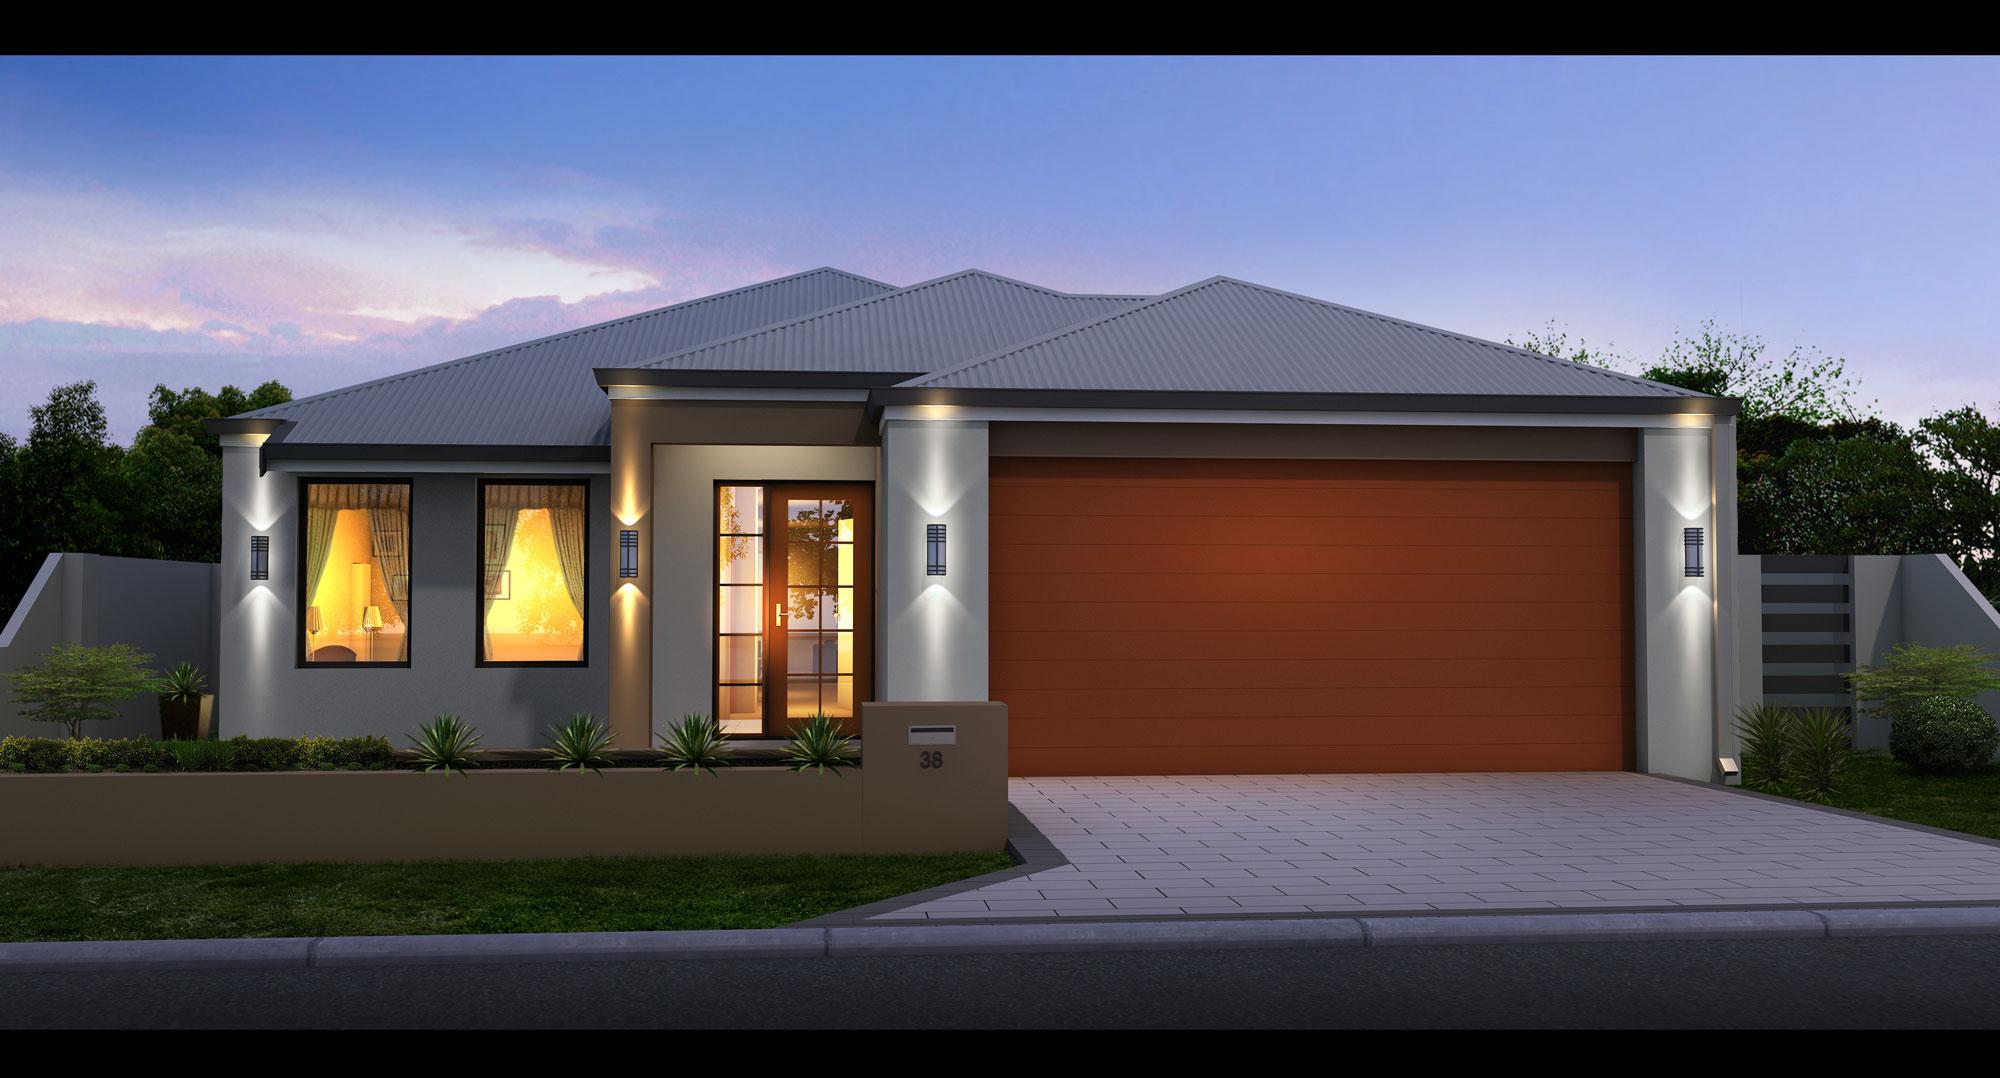 Osborne-Front-Garage house design